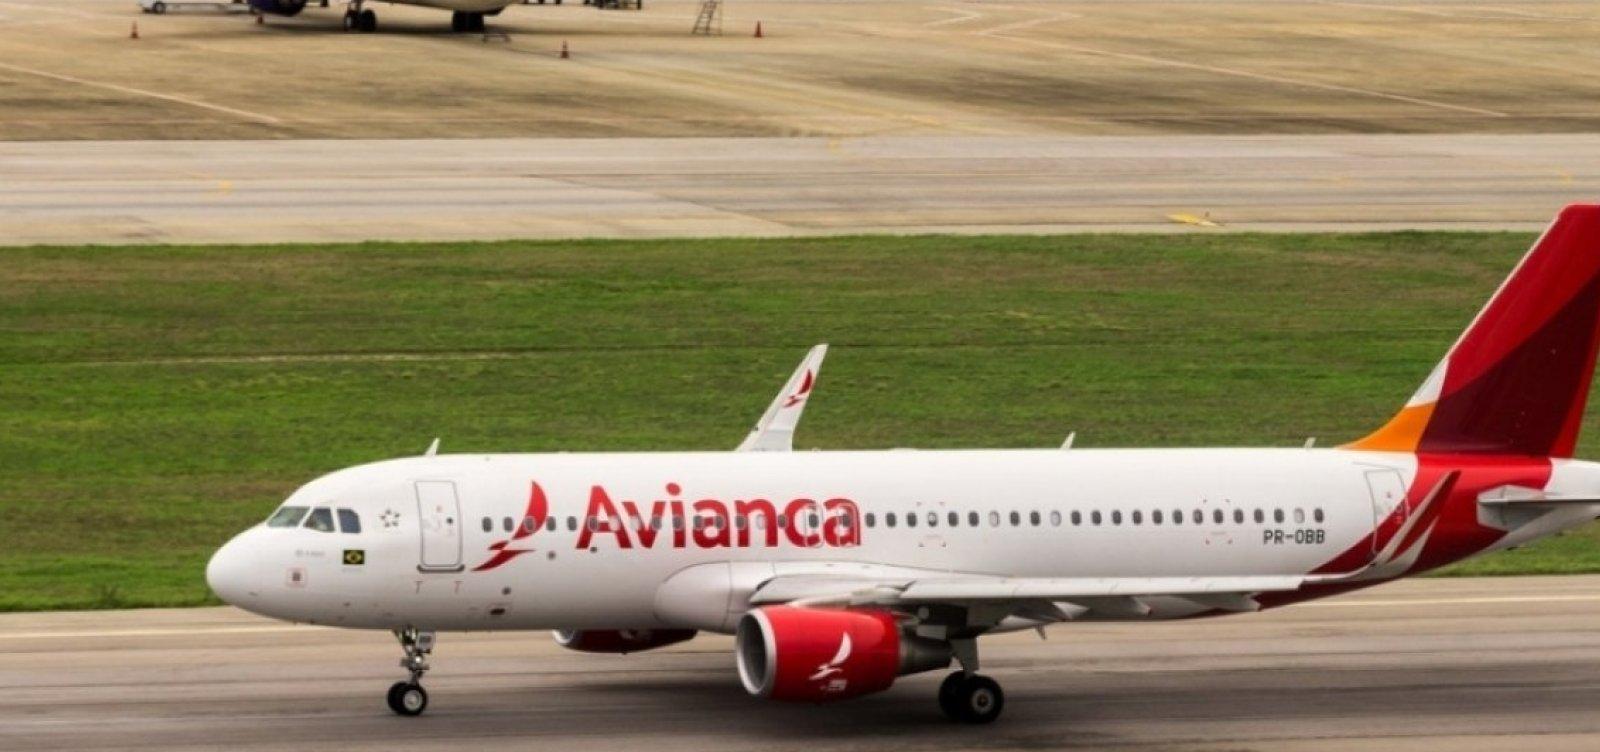 Em Fortaleza, Avianca também só irá operar caso repasse tarifas dos voos